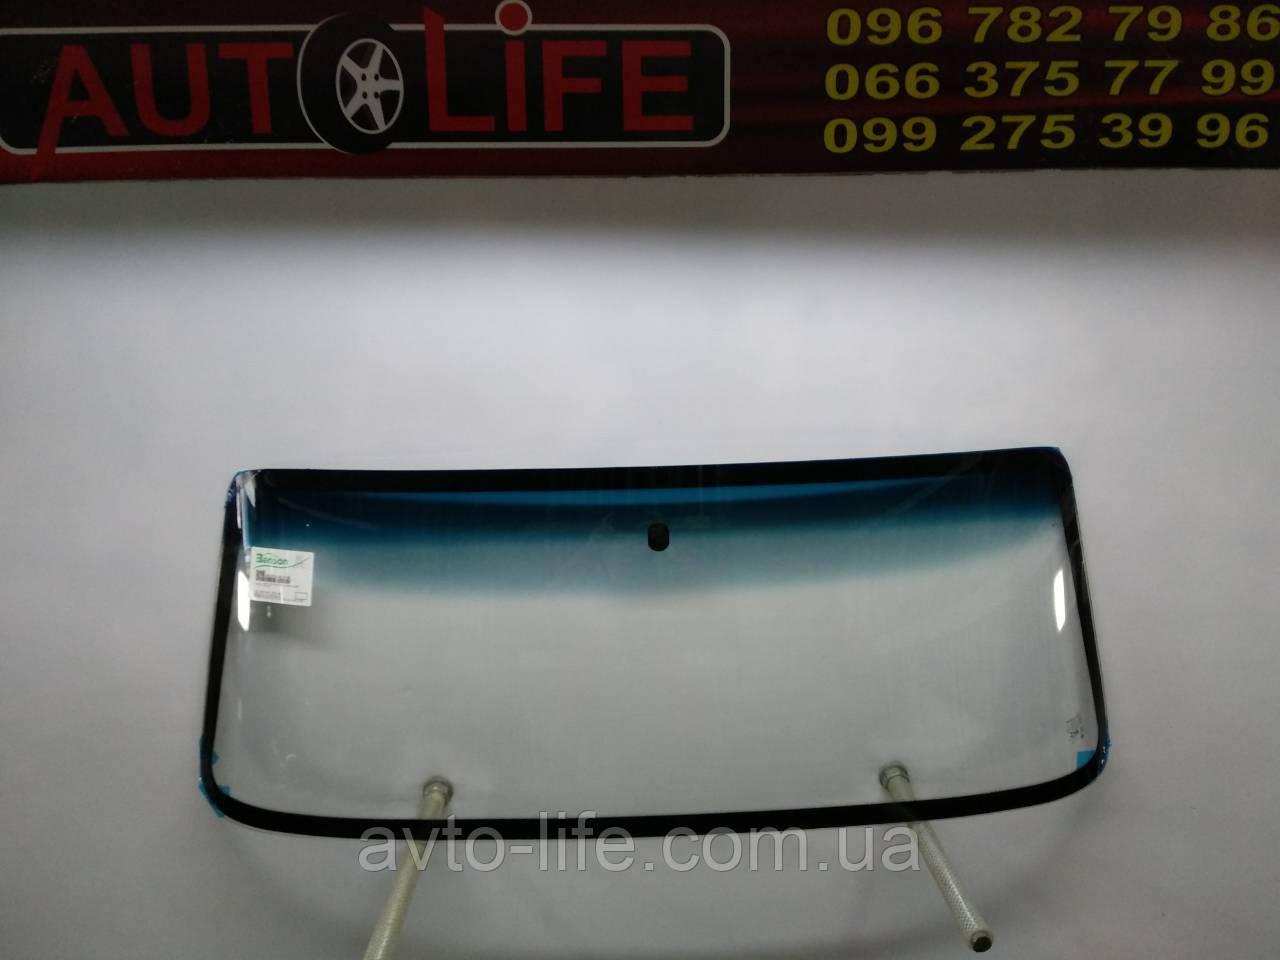 Лобовое стекло ВАЗ 2101-2107 (1774-2012) / Fiat 124-125 | Автостекло ВАЗ 2101-2107